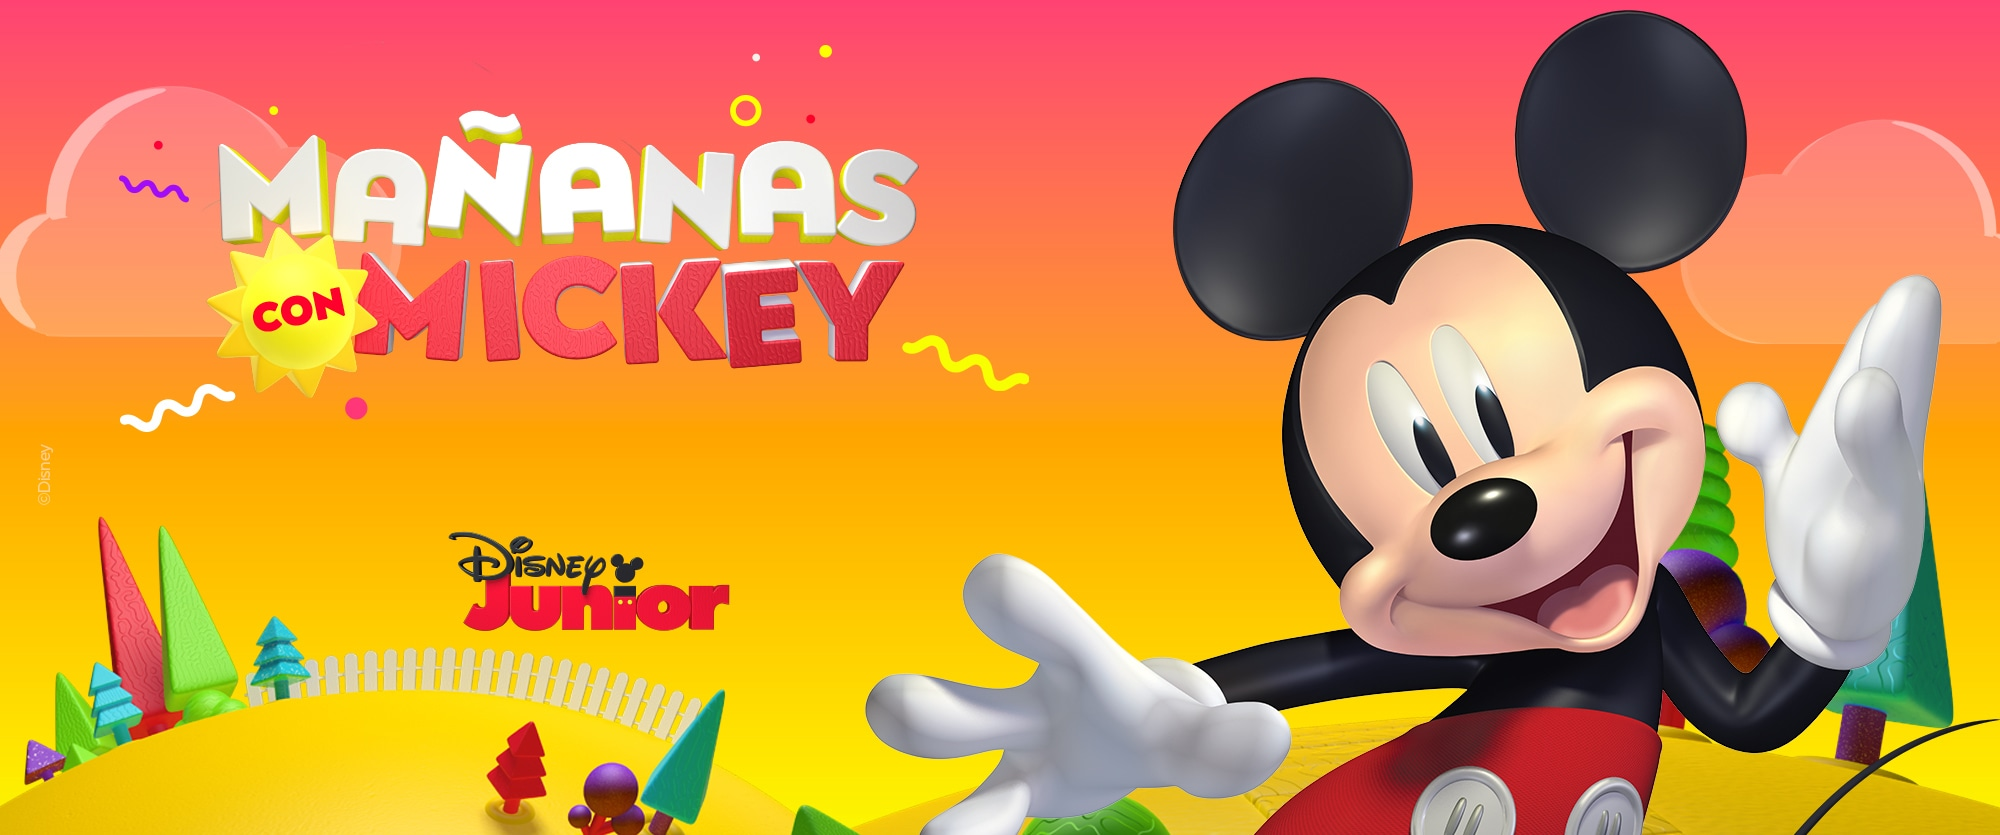 Mañanas con Mickey